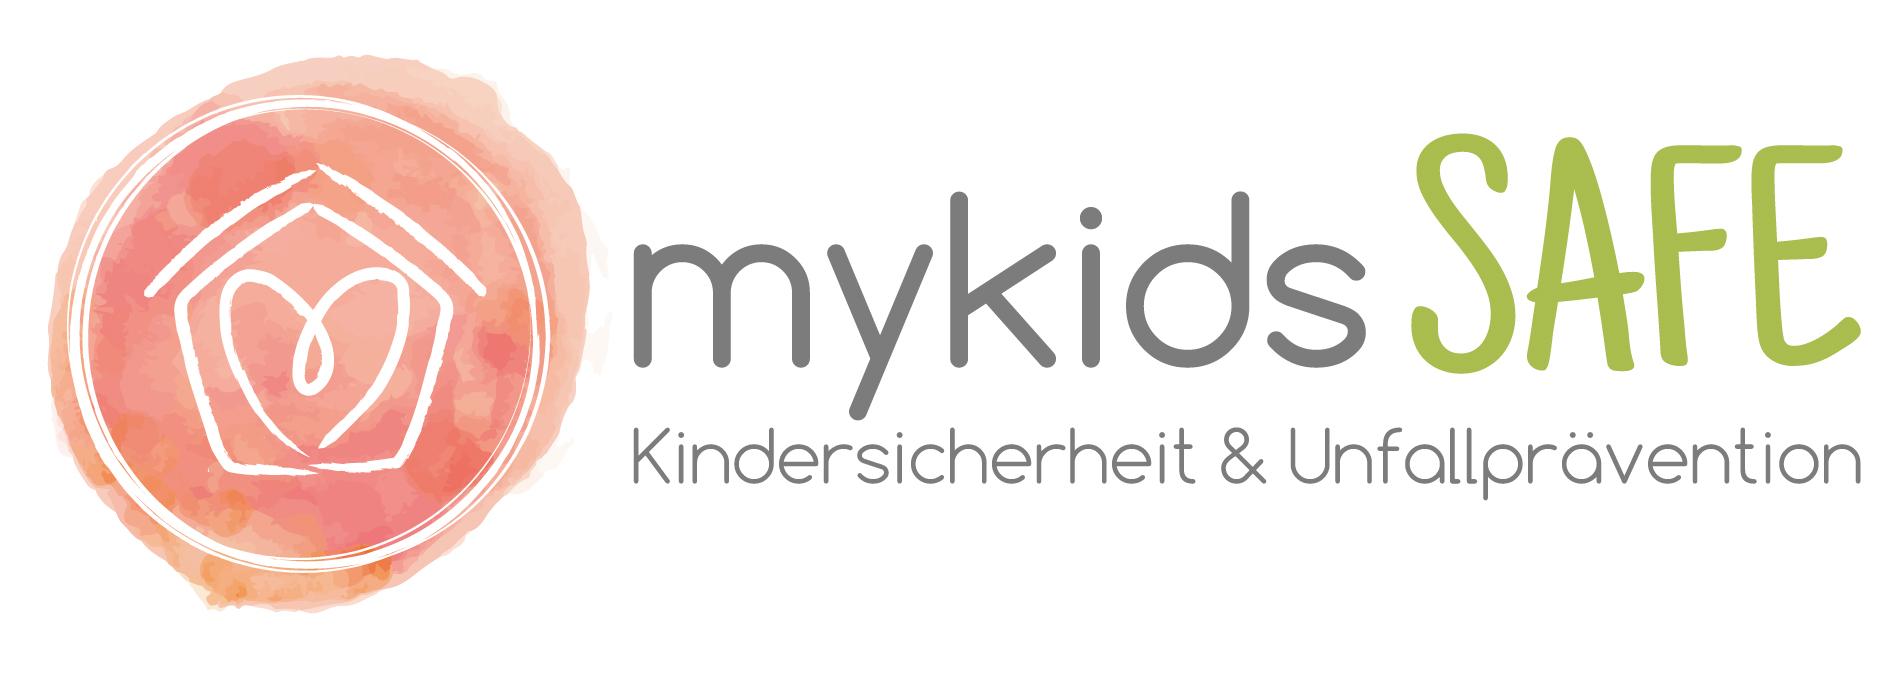 mykidssafe